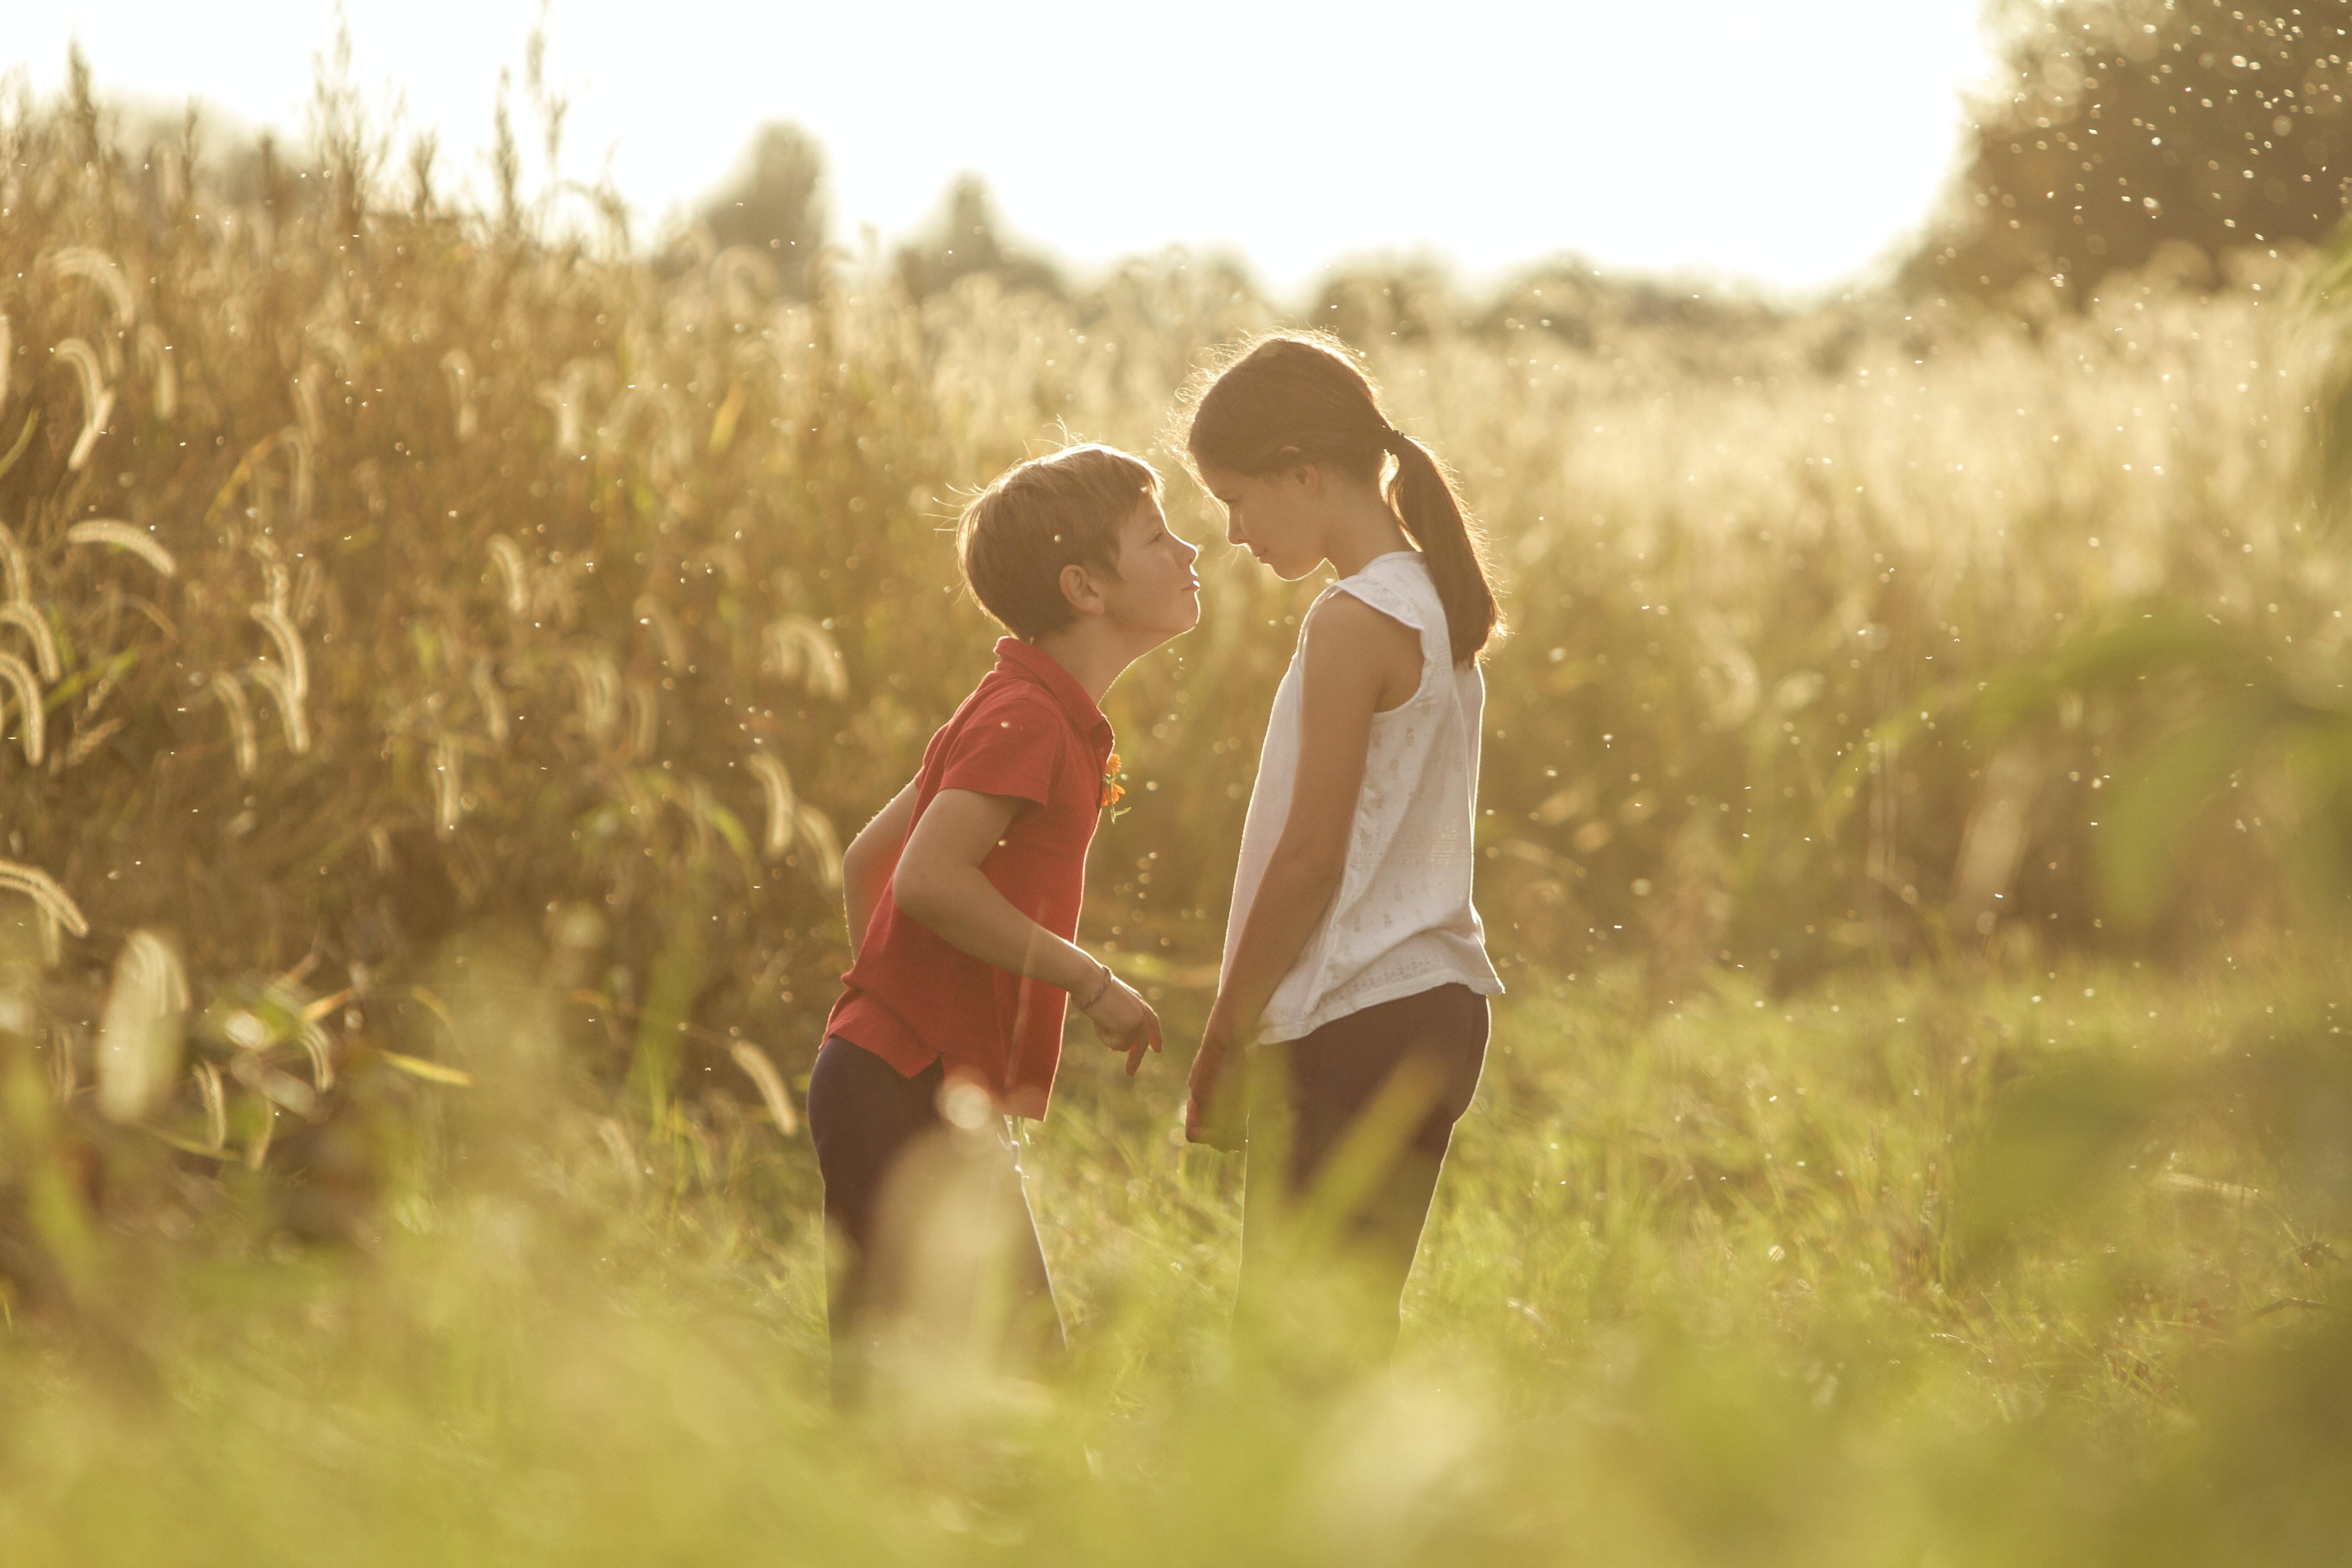 girl in white dress beside boy in red shirt standing on green grass field